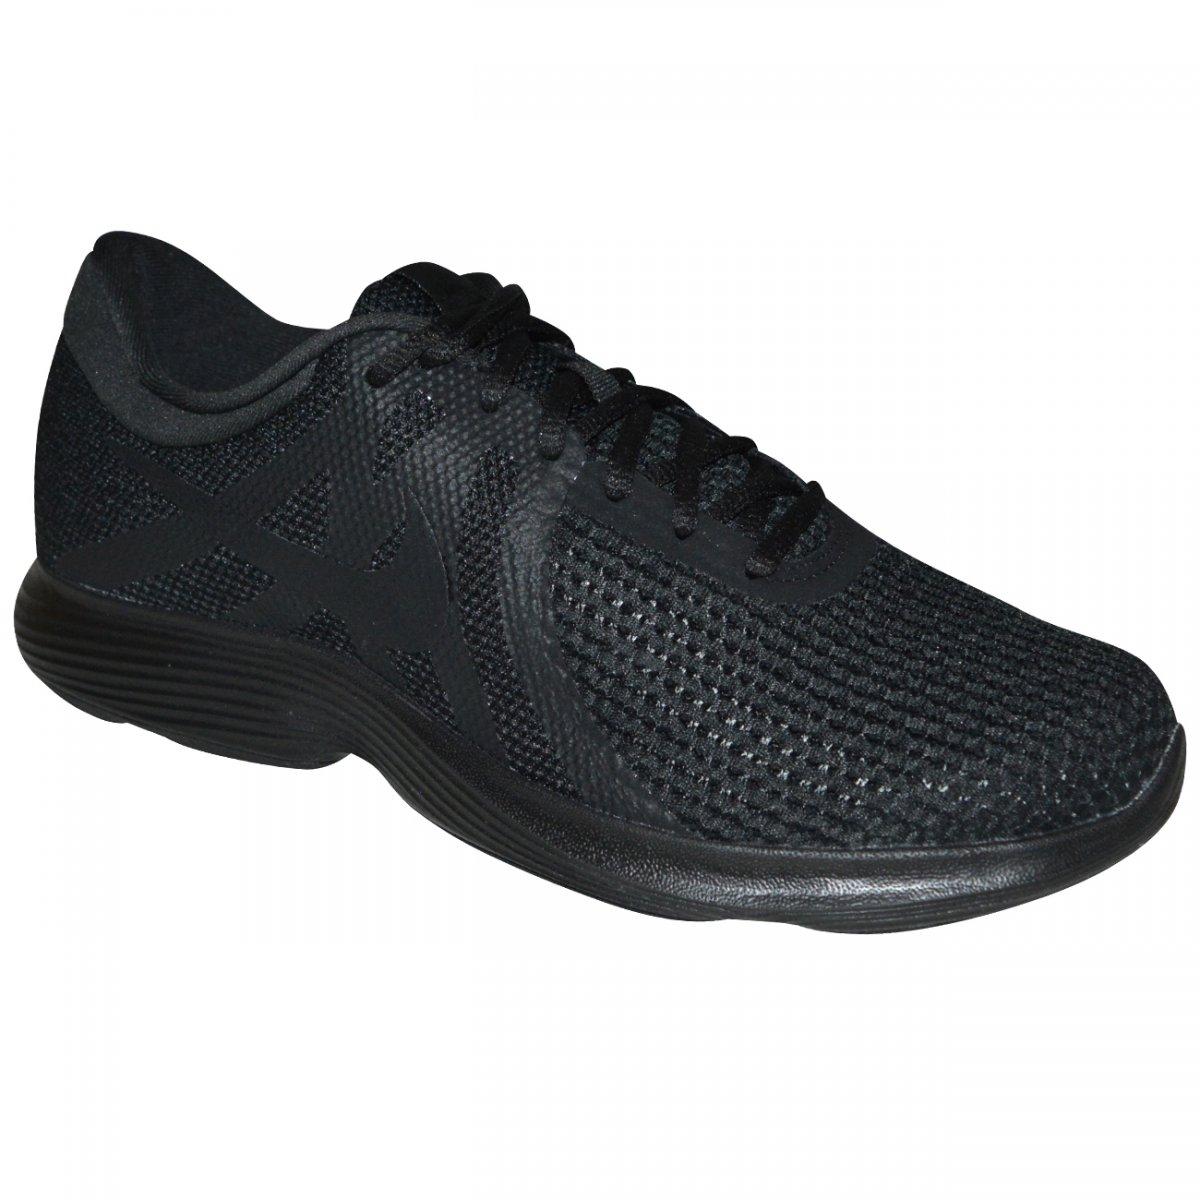 Tenis Nike Revolution 4 908988 002 - Preto preto - Chuteira Nike ... 2c3765120d353